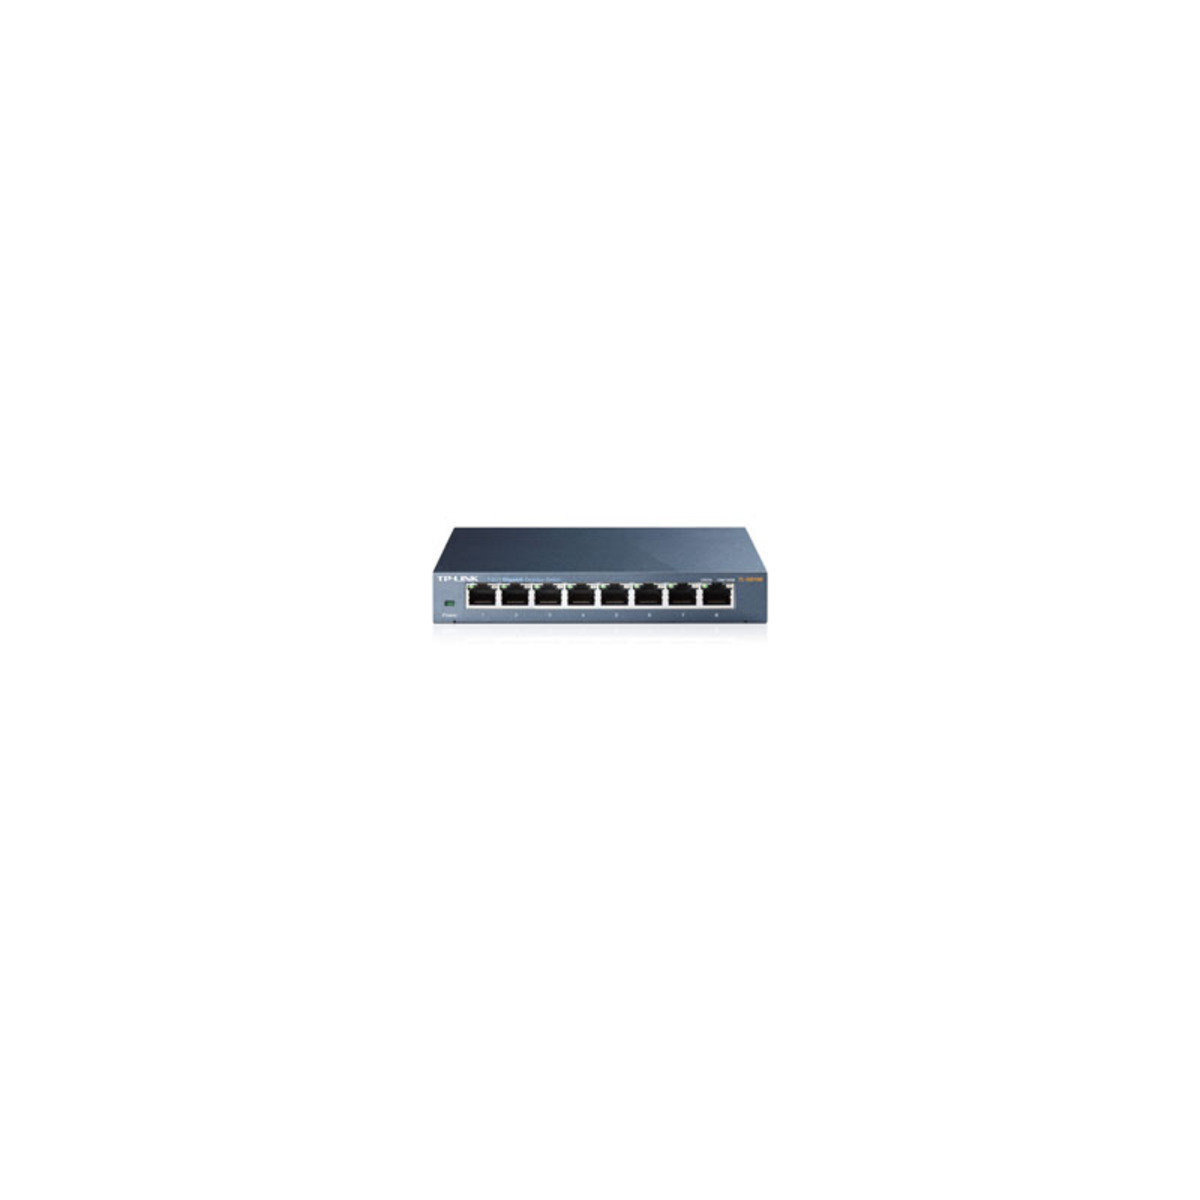 8-Ports Gigabit 網絡分線器 TL-SG108